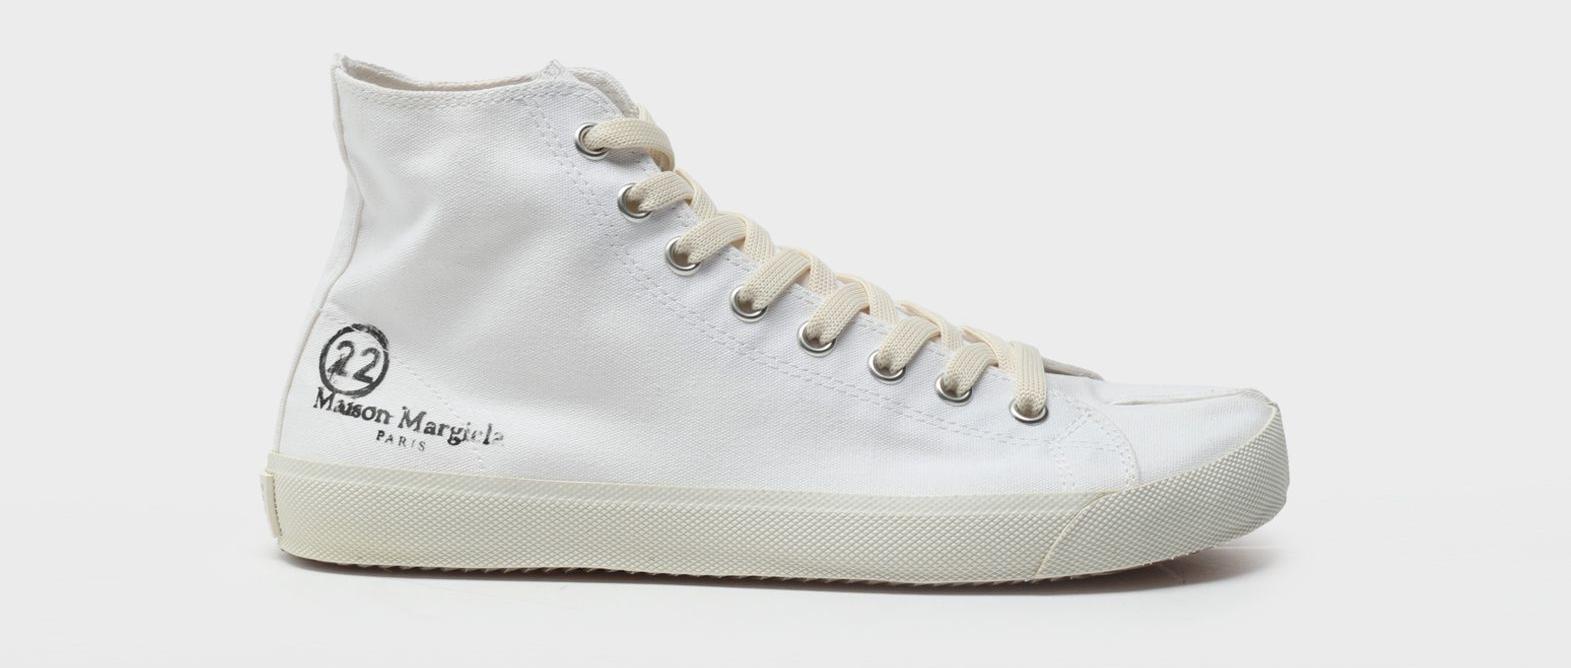 Maison Margiela Tabi Sneakers $ 495